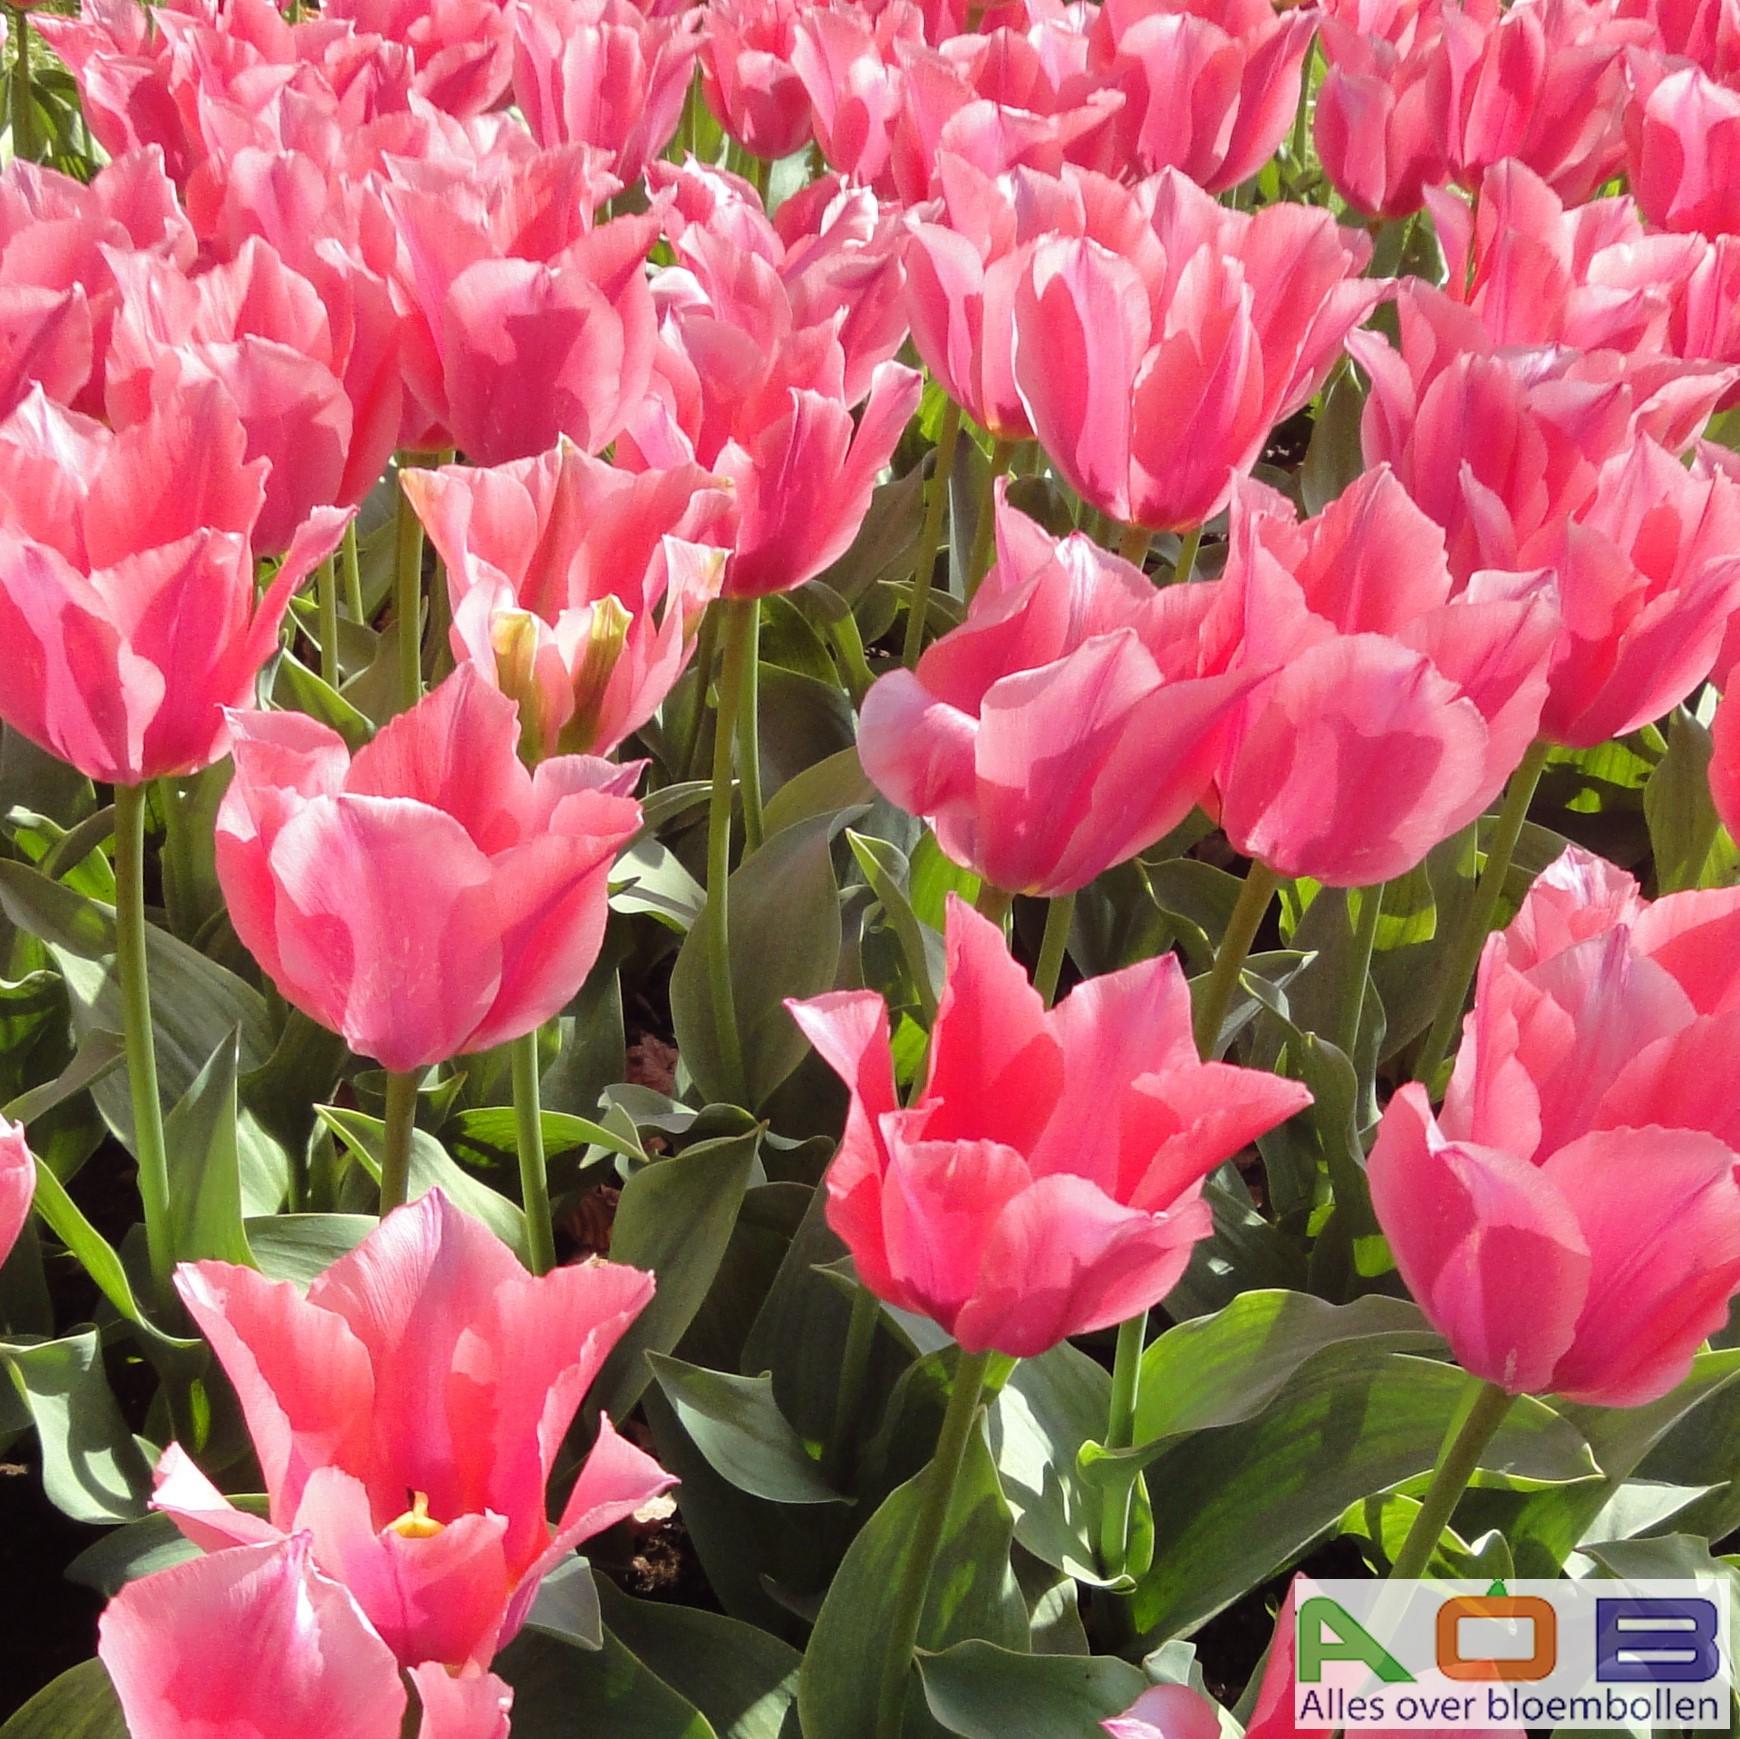 Tulipa 'Albert Heijn'